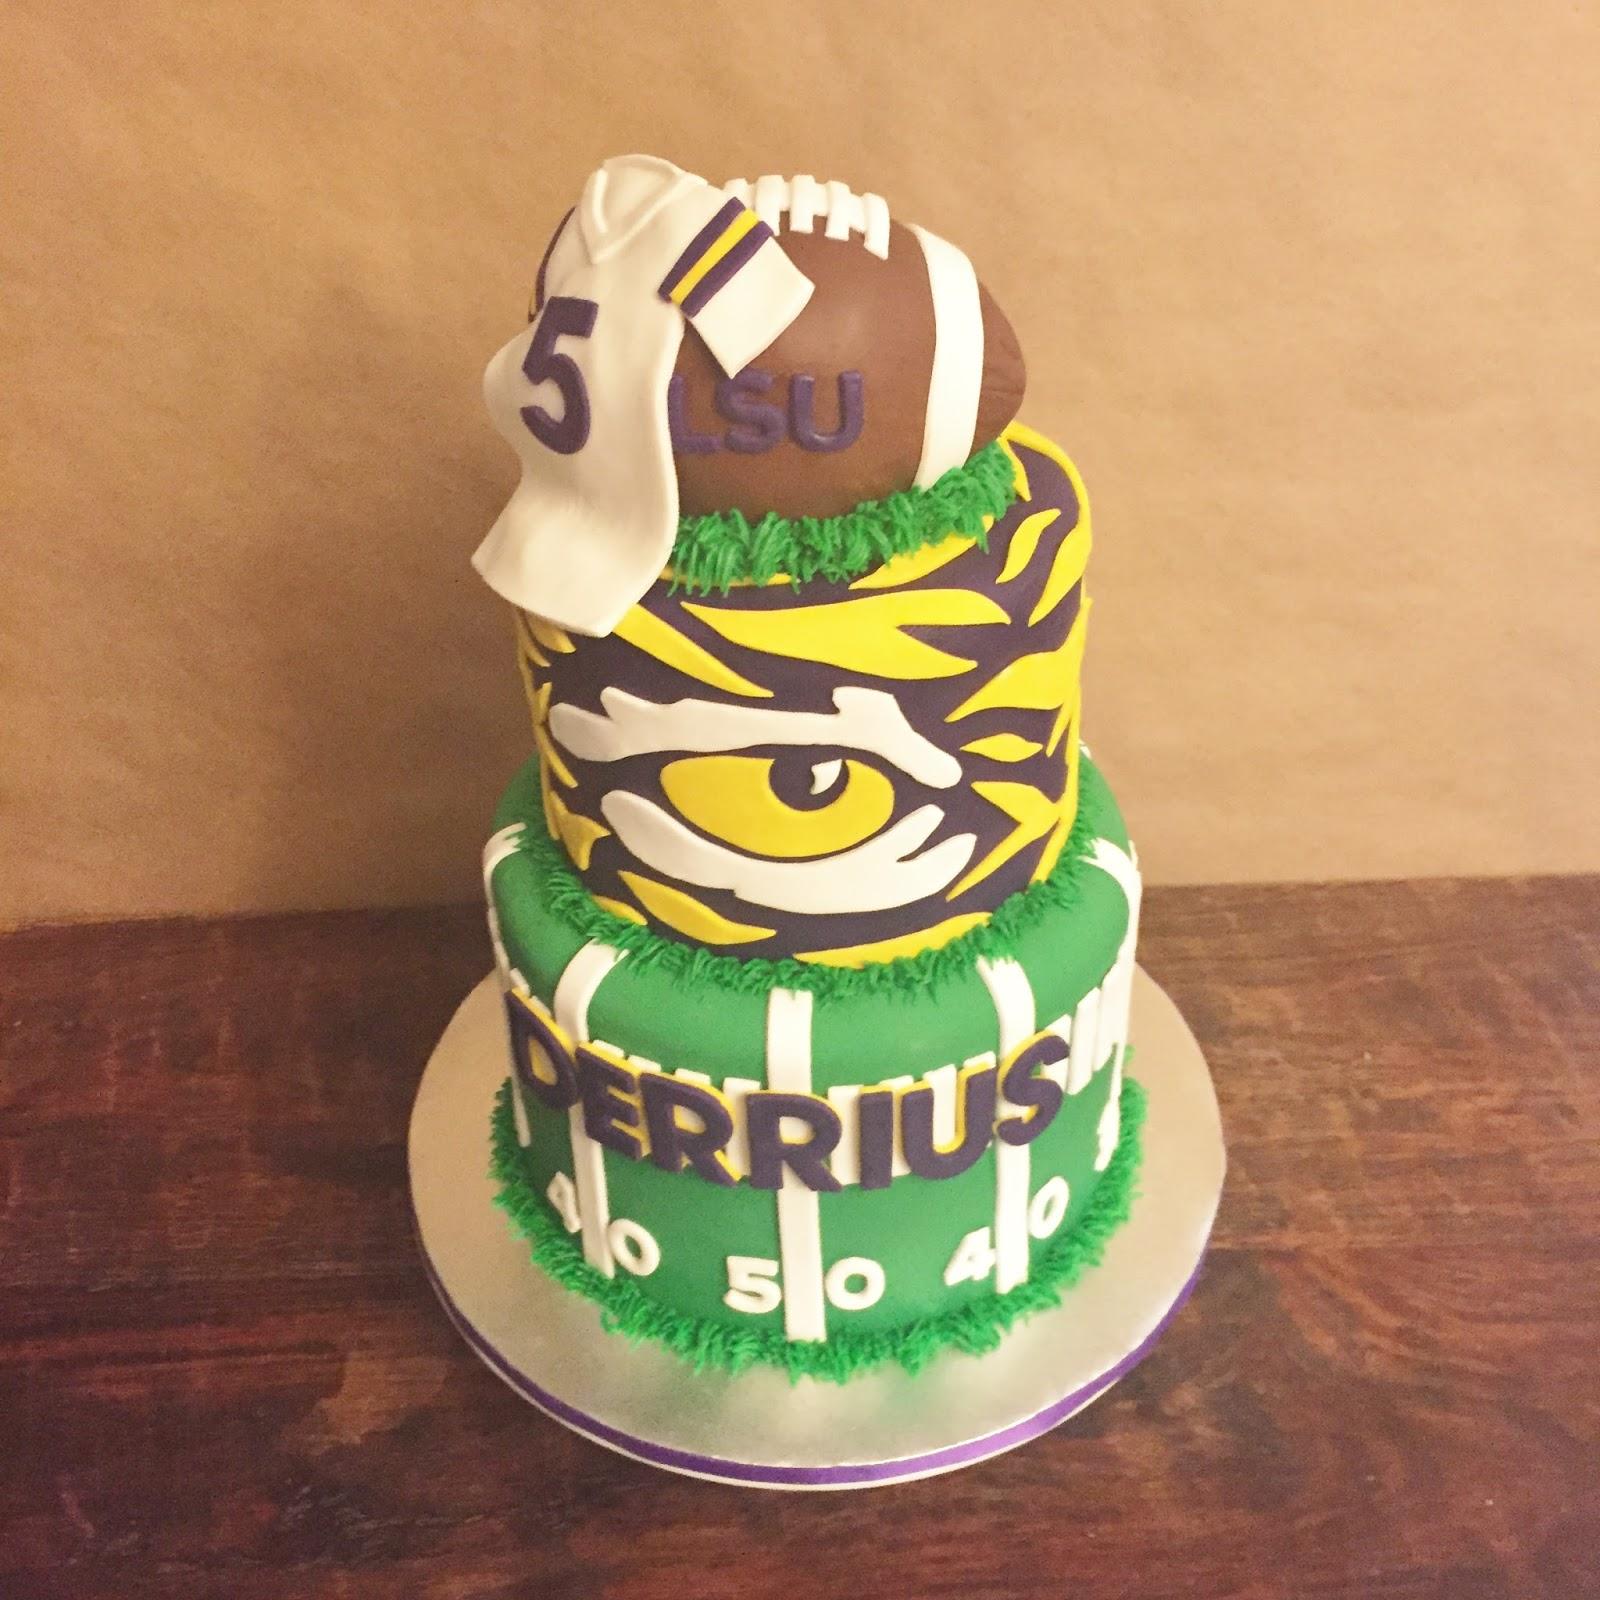 Marvelous Cakes By Mindy Lsu Tigers Football Cake 6 8 Funny Birthday Cards Online Necthendildamsfinfo